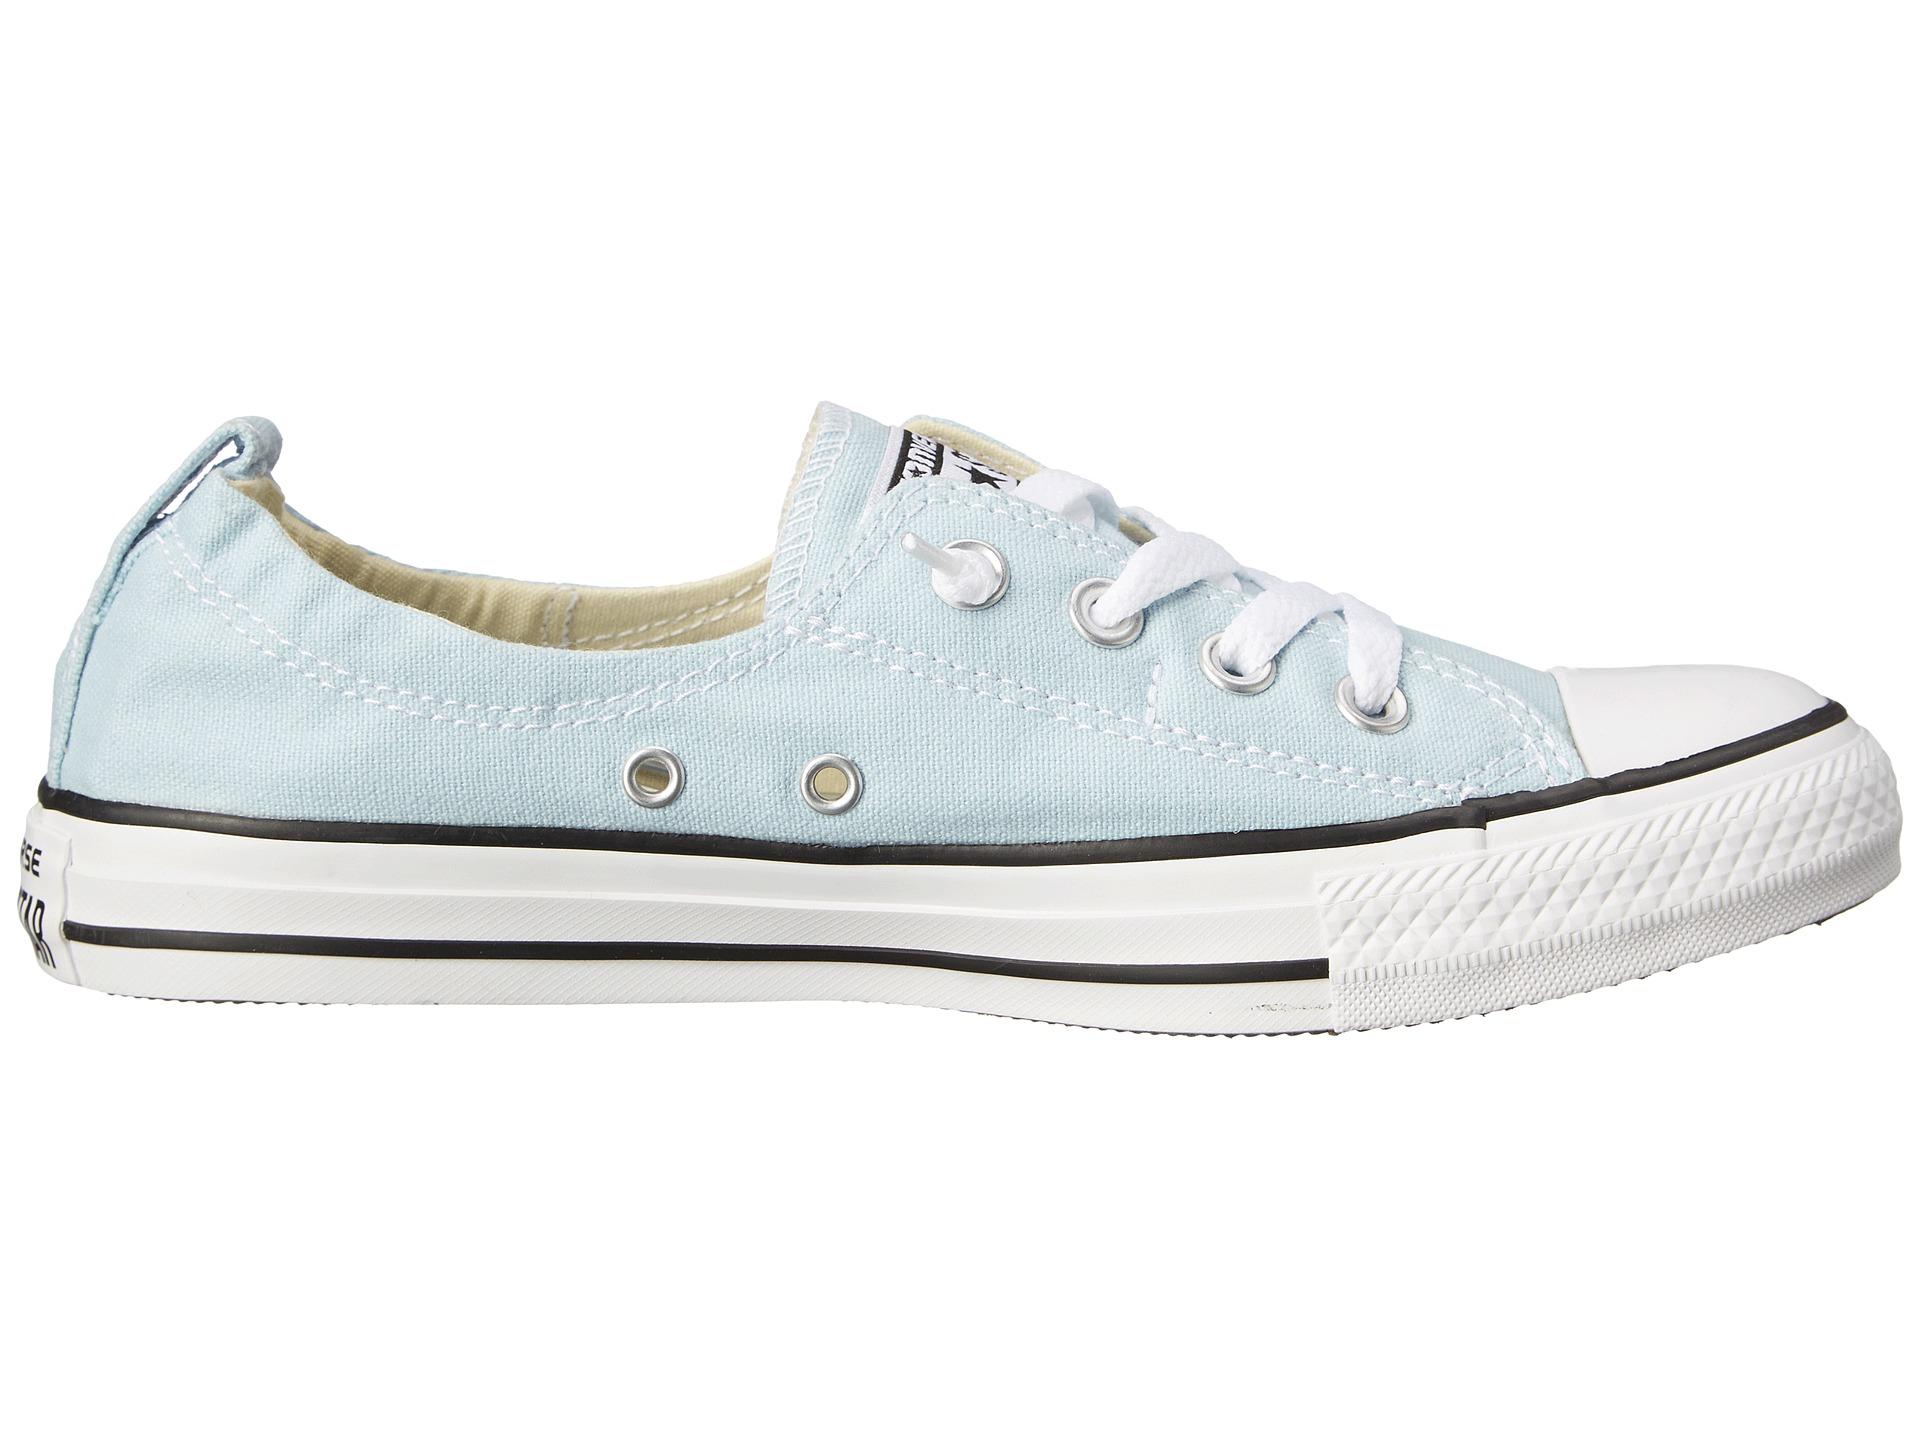 f2820e2a888 Lyst - Converse Chuck Taylor® All Star® Fashion Basics Shoreline in Blue